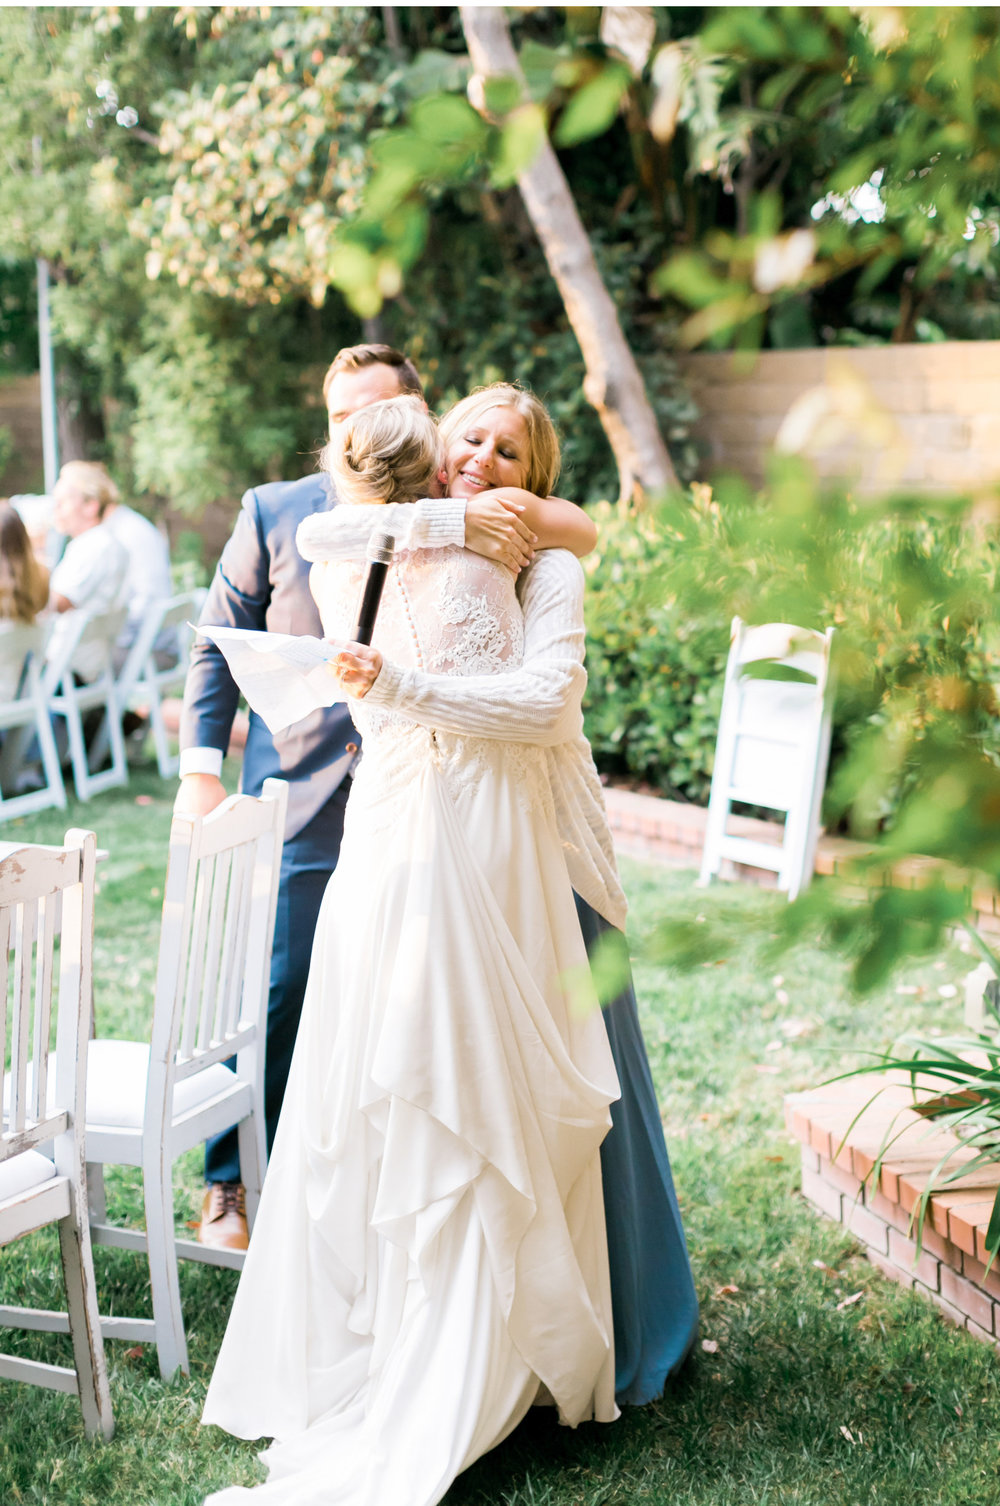 Malibu-Wedding-Photographer-Natalie-Schutt-Photography-Fine-Art-Film-Photography_05.jpg